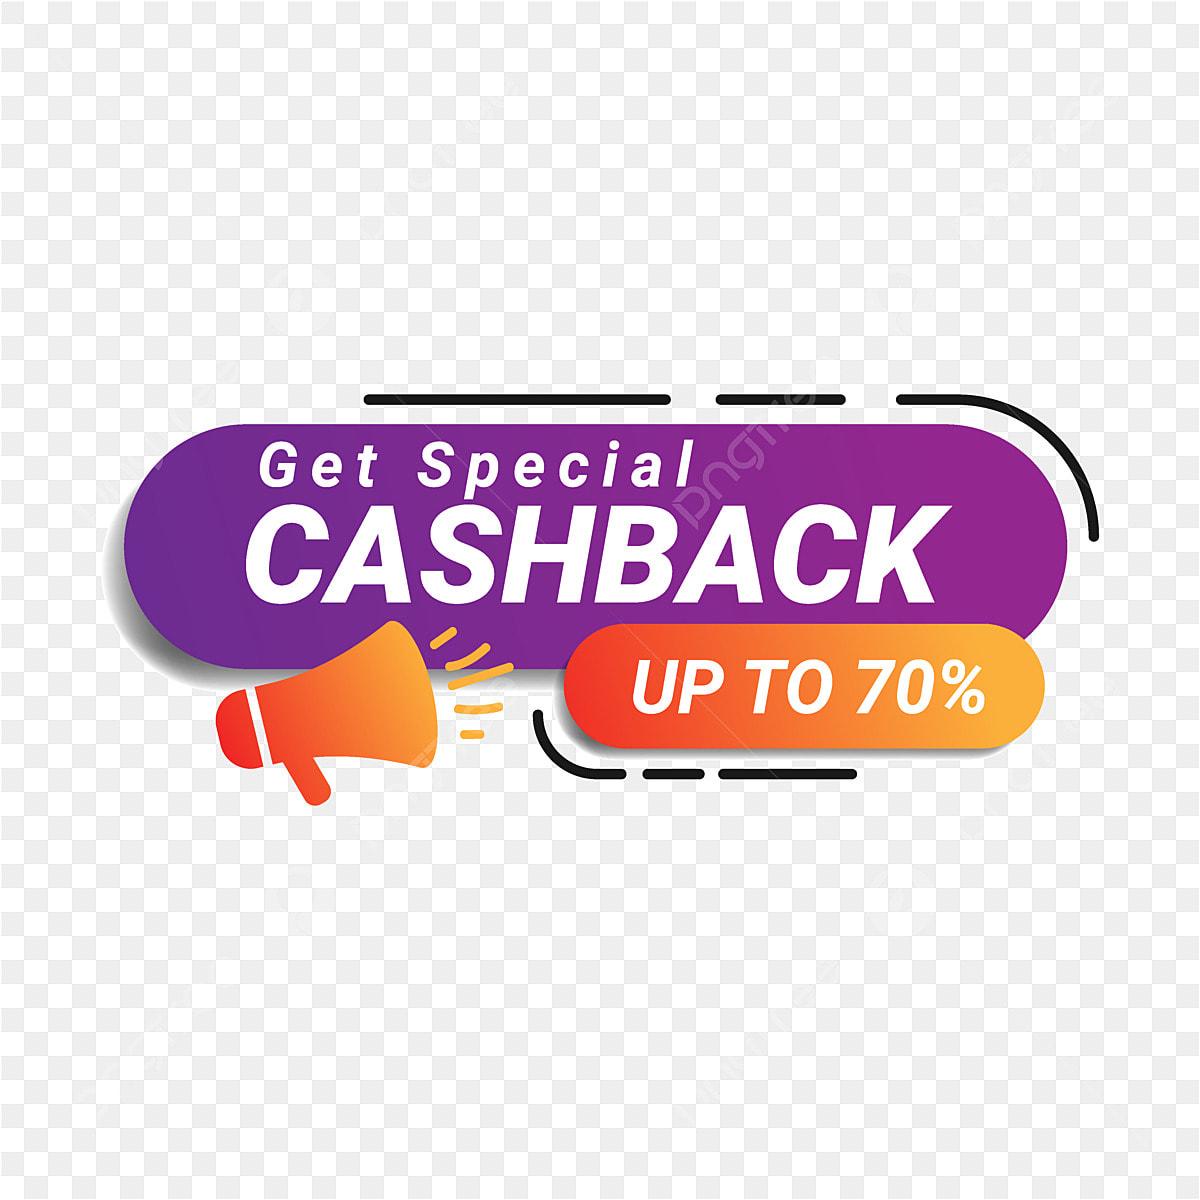 cashback png images vector and psd files free download on pngtree https pngtree com freepng purple cashback label and orange speaker icon 5386213 html